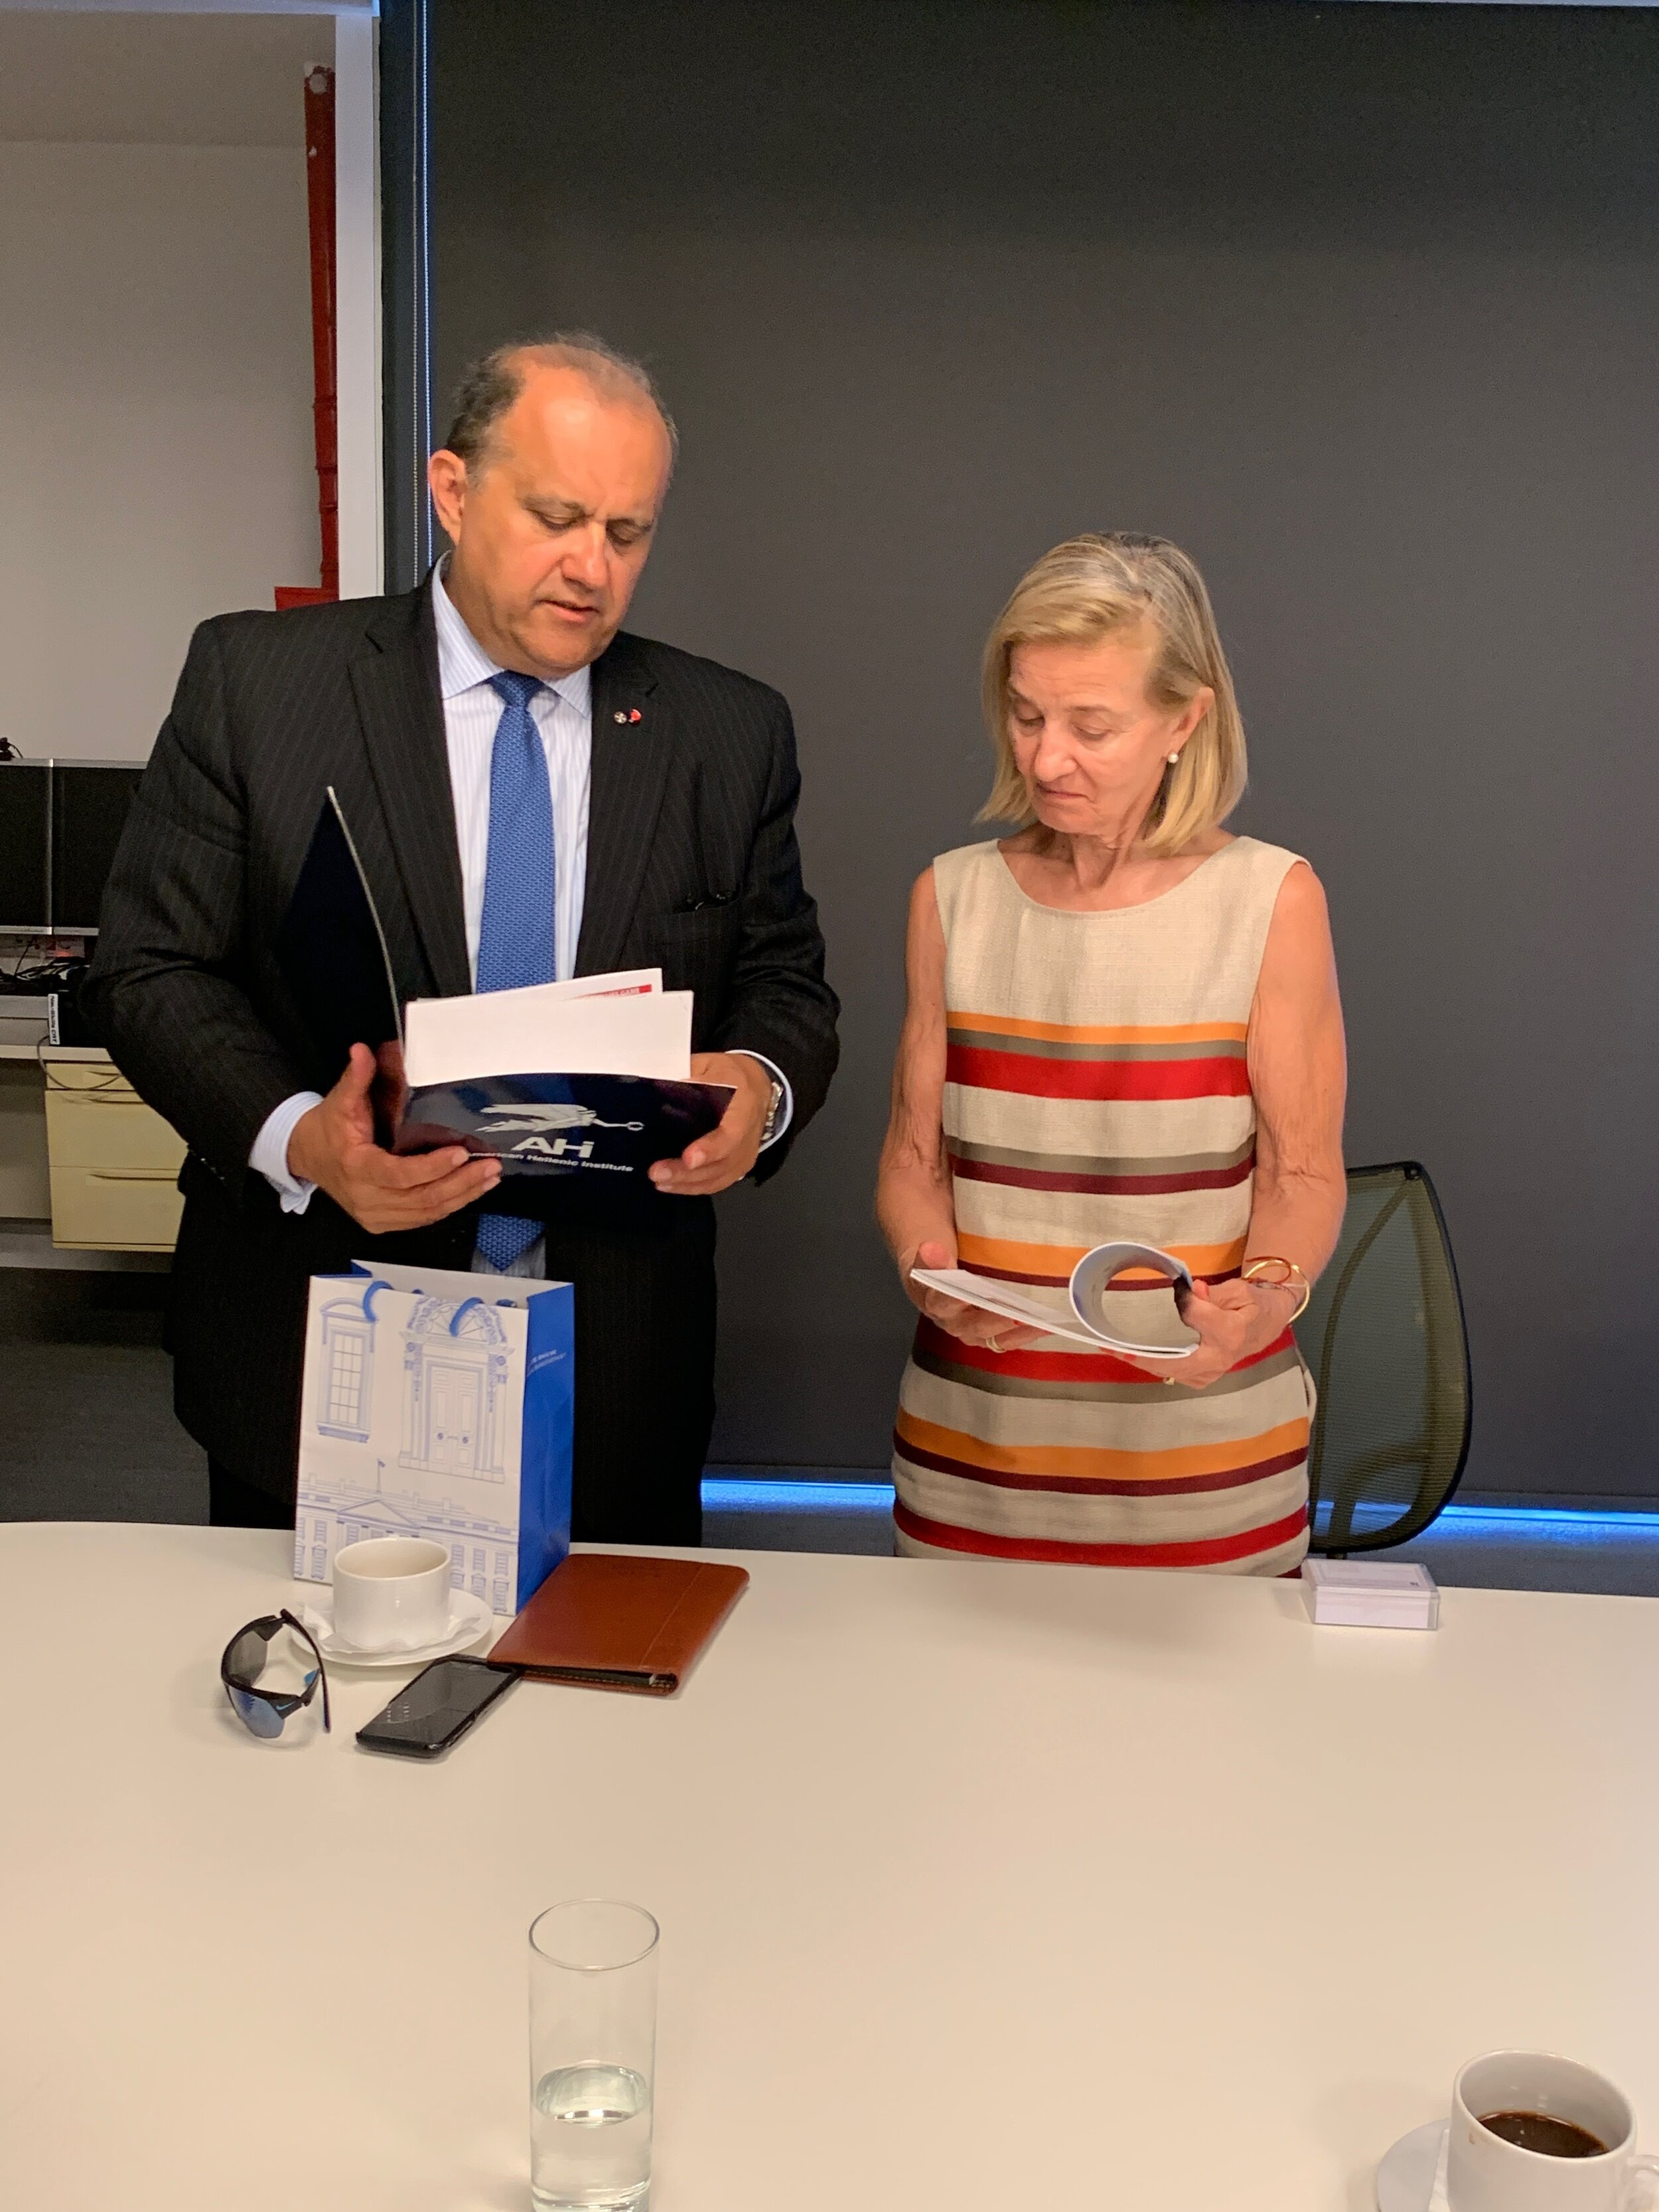 AHI President Nick Larigakis sharing AHI's policy papers with Mrs. Marina Martinou